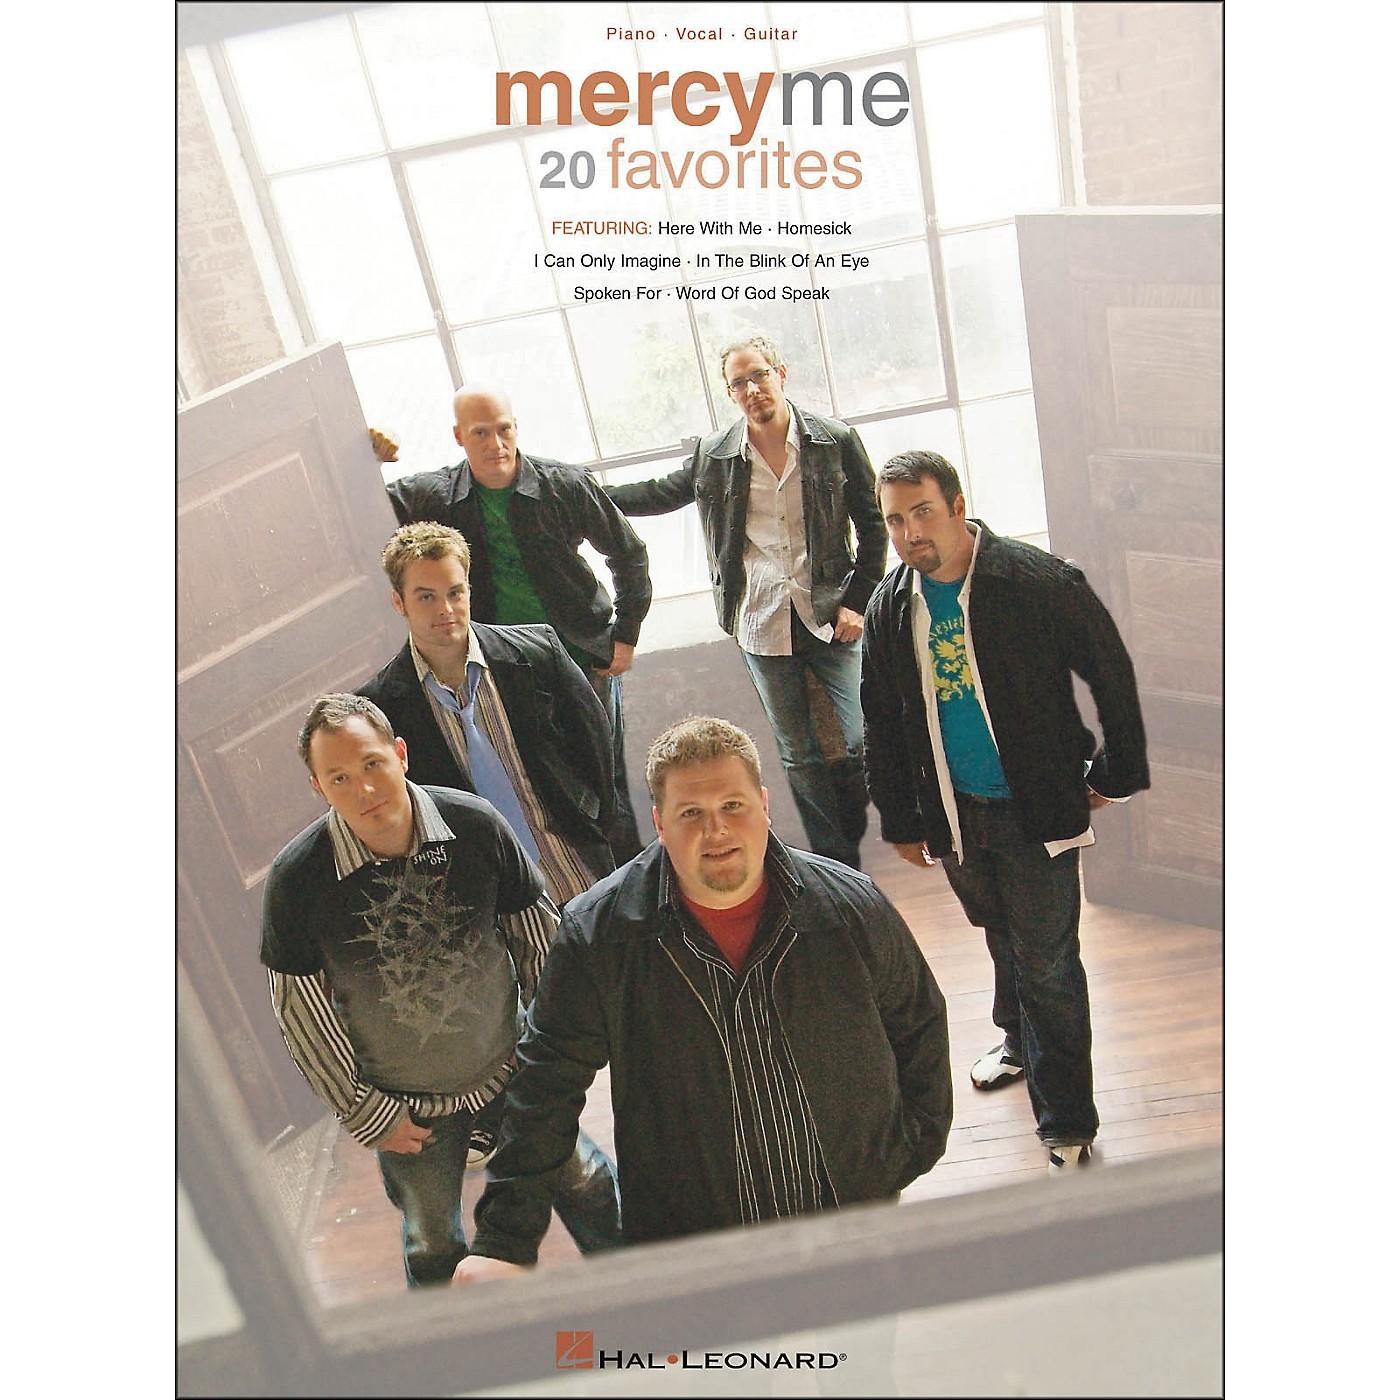 Hal Leonard MercyMe 20 Favorites Piano Vocal Guitar arranged for piano, vocal, and guitar (P/V/G) thumbnail